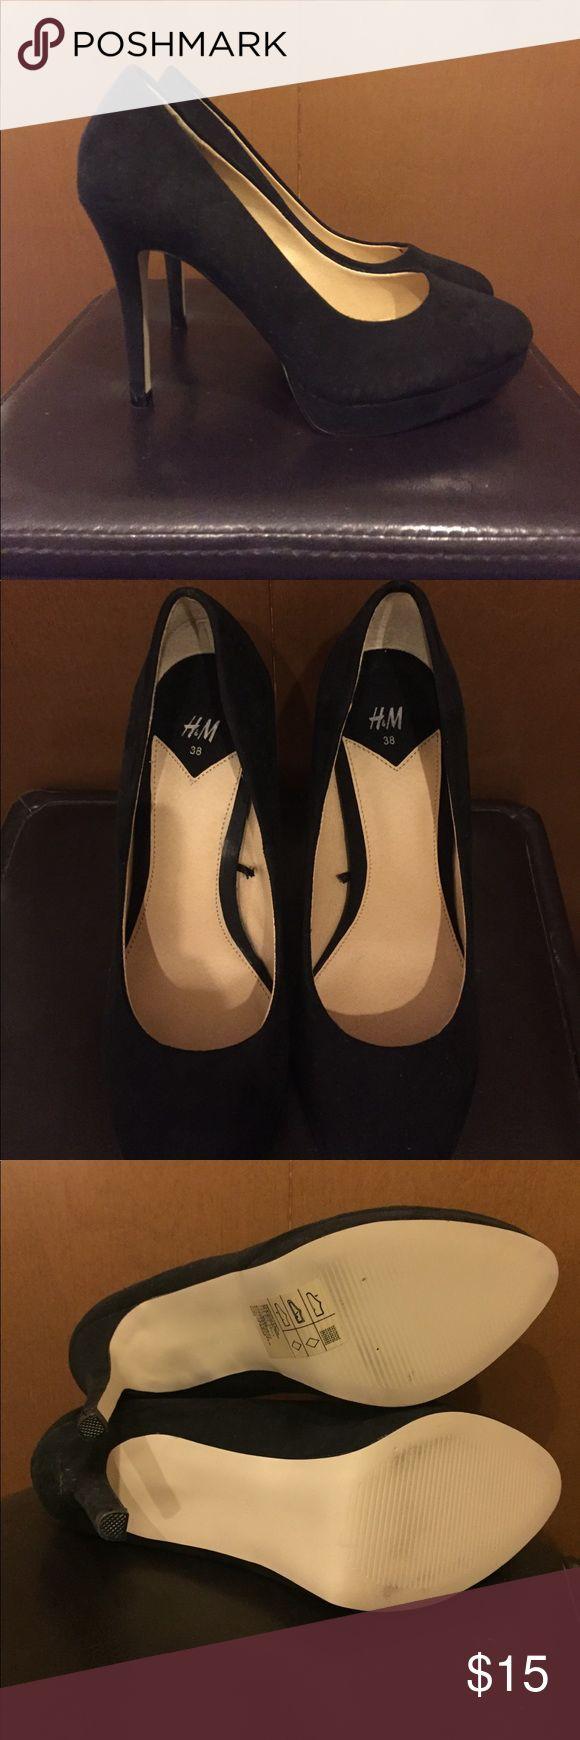 "H&M Platform Stiletto Heel - Size 7 H&M Platform Stiletto Heel - Size 7 NWOT Black faux suede. Tried on a few times around the house but never worn outside. 8.5"" long; 3"" wide footbed; 3/4"" platform w/ 4"" stiletto heel. H&M Shoes Heels"